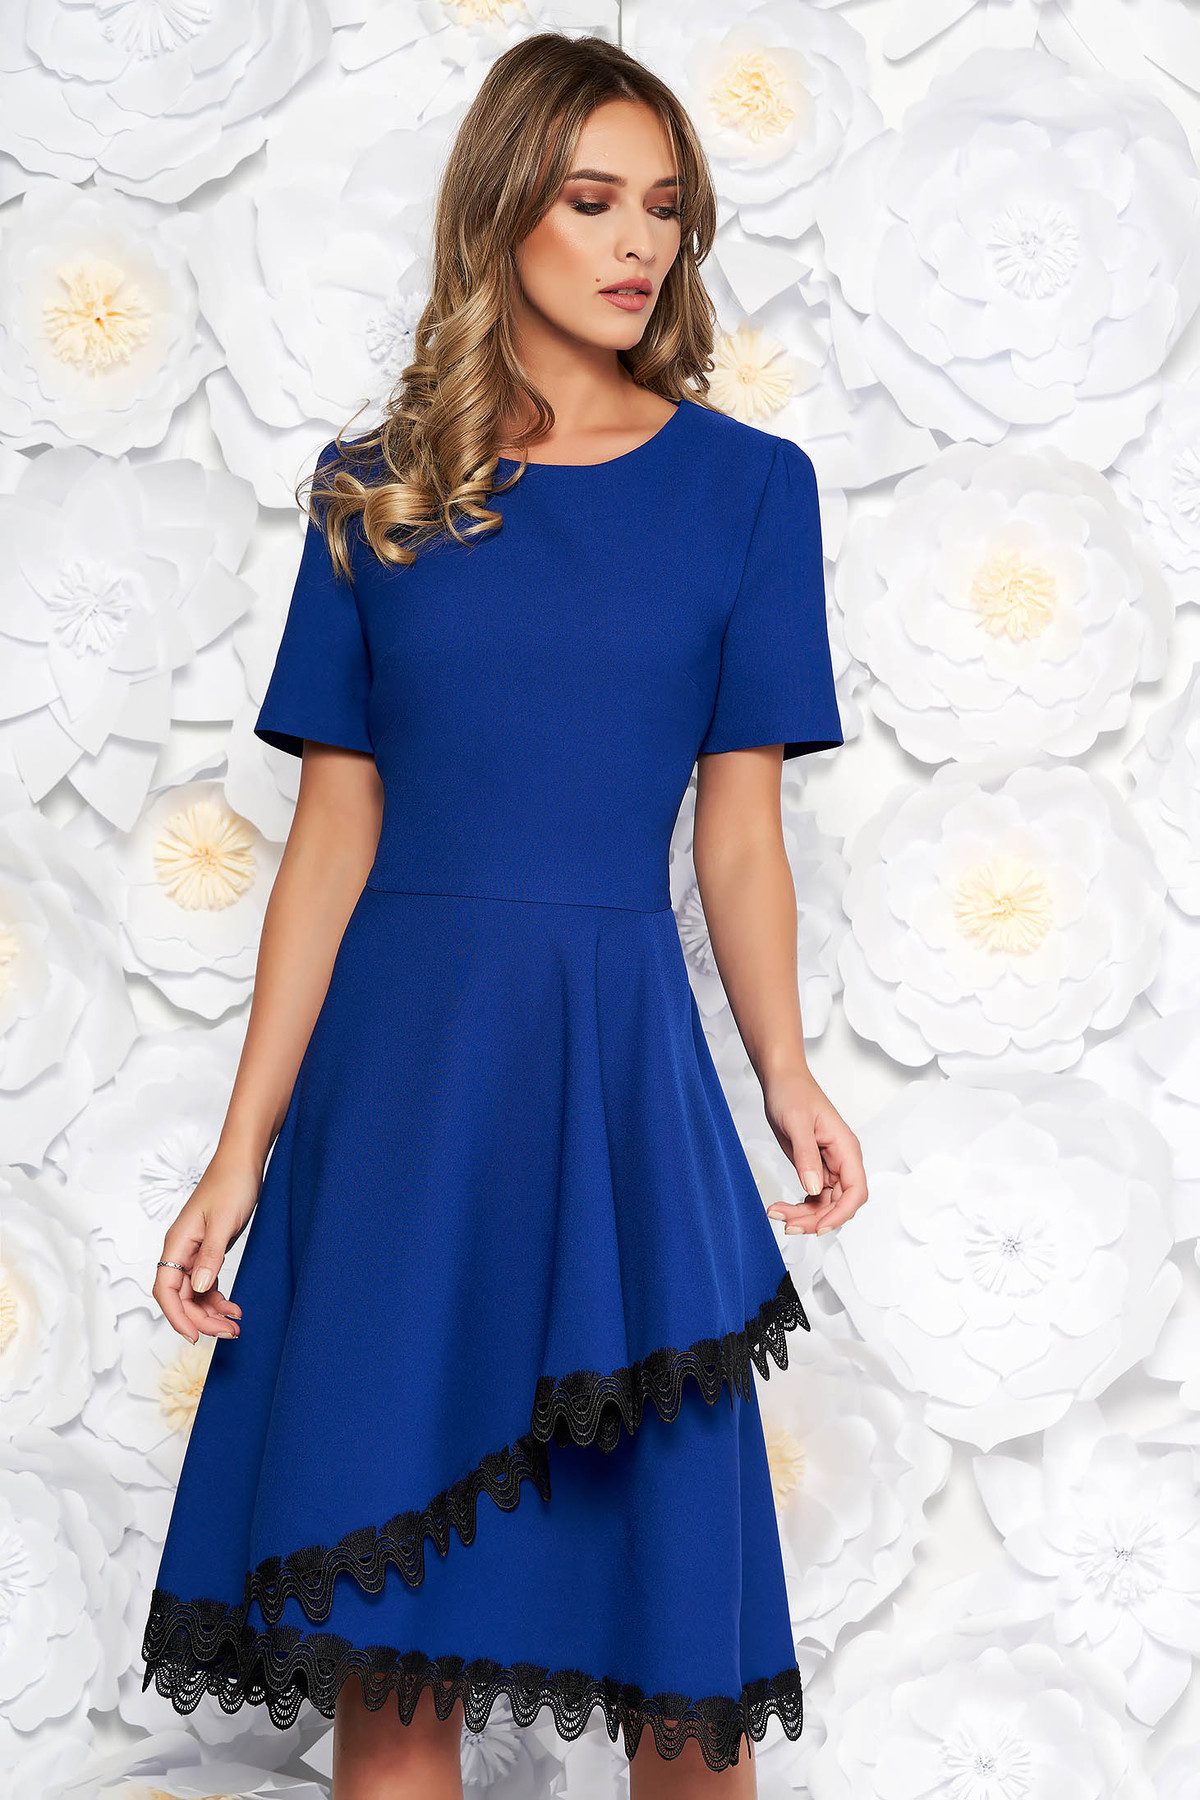 Rochie albastra eleganta midi in clos din stofa elastica subtire cu volanase cu aplicatii de dantela